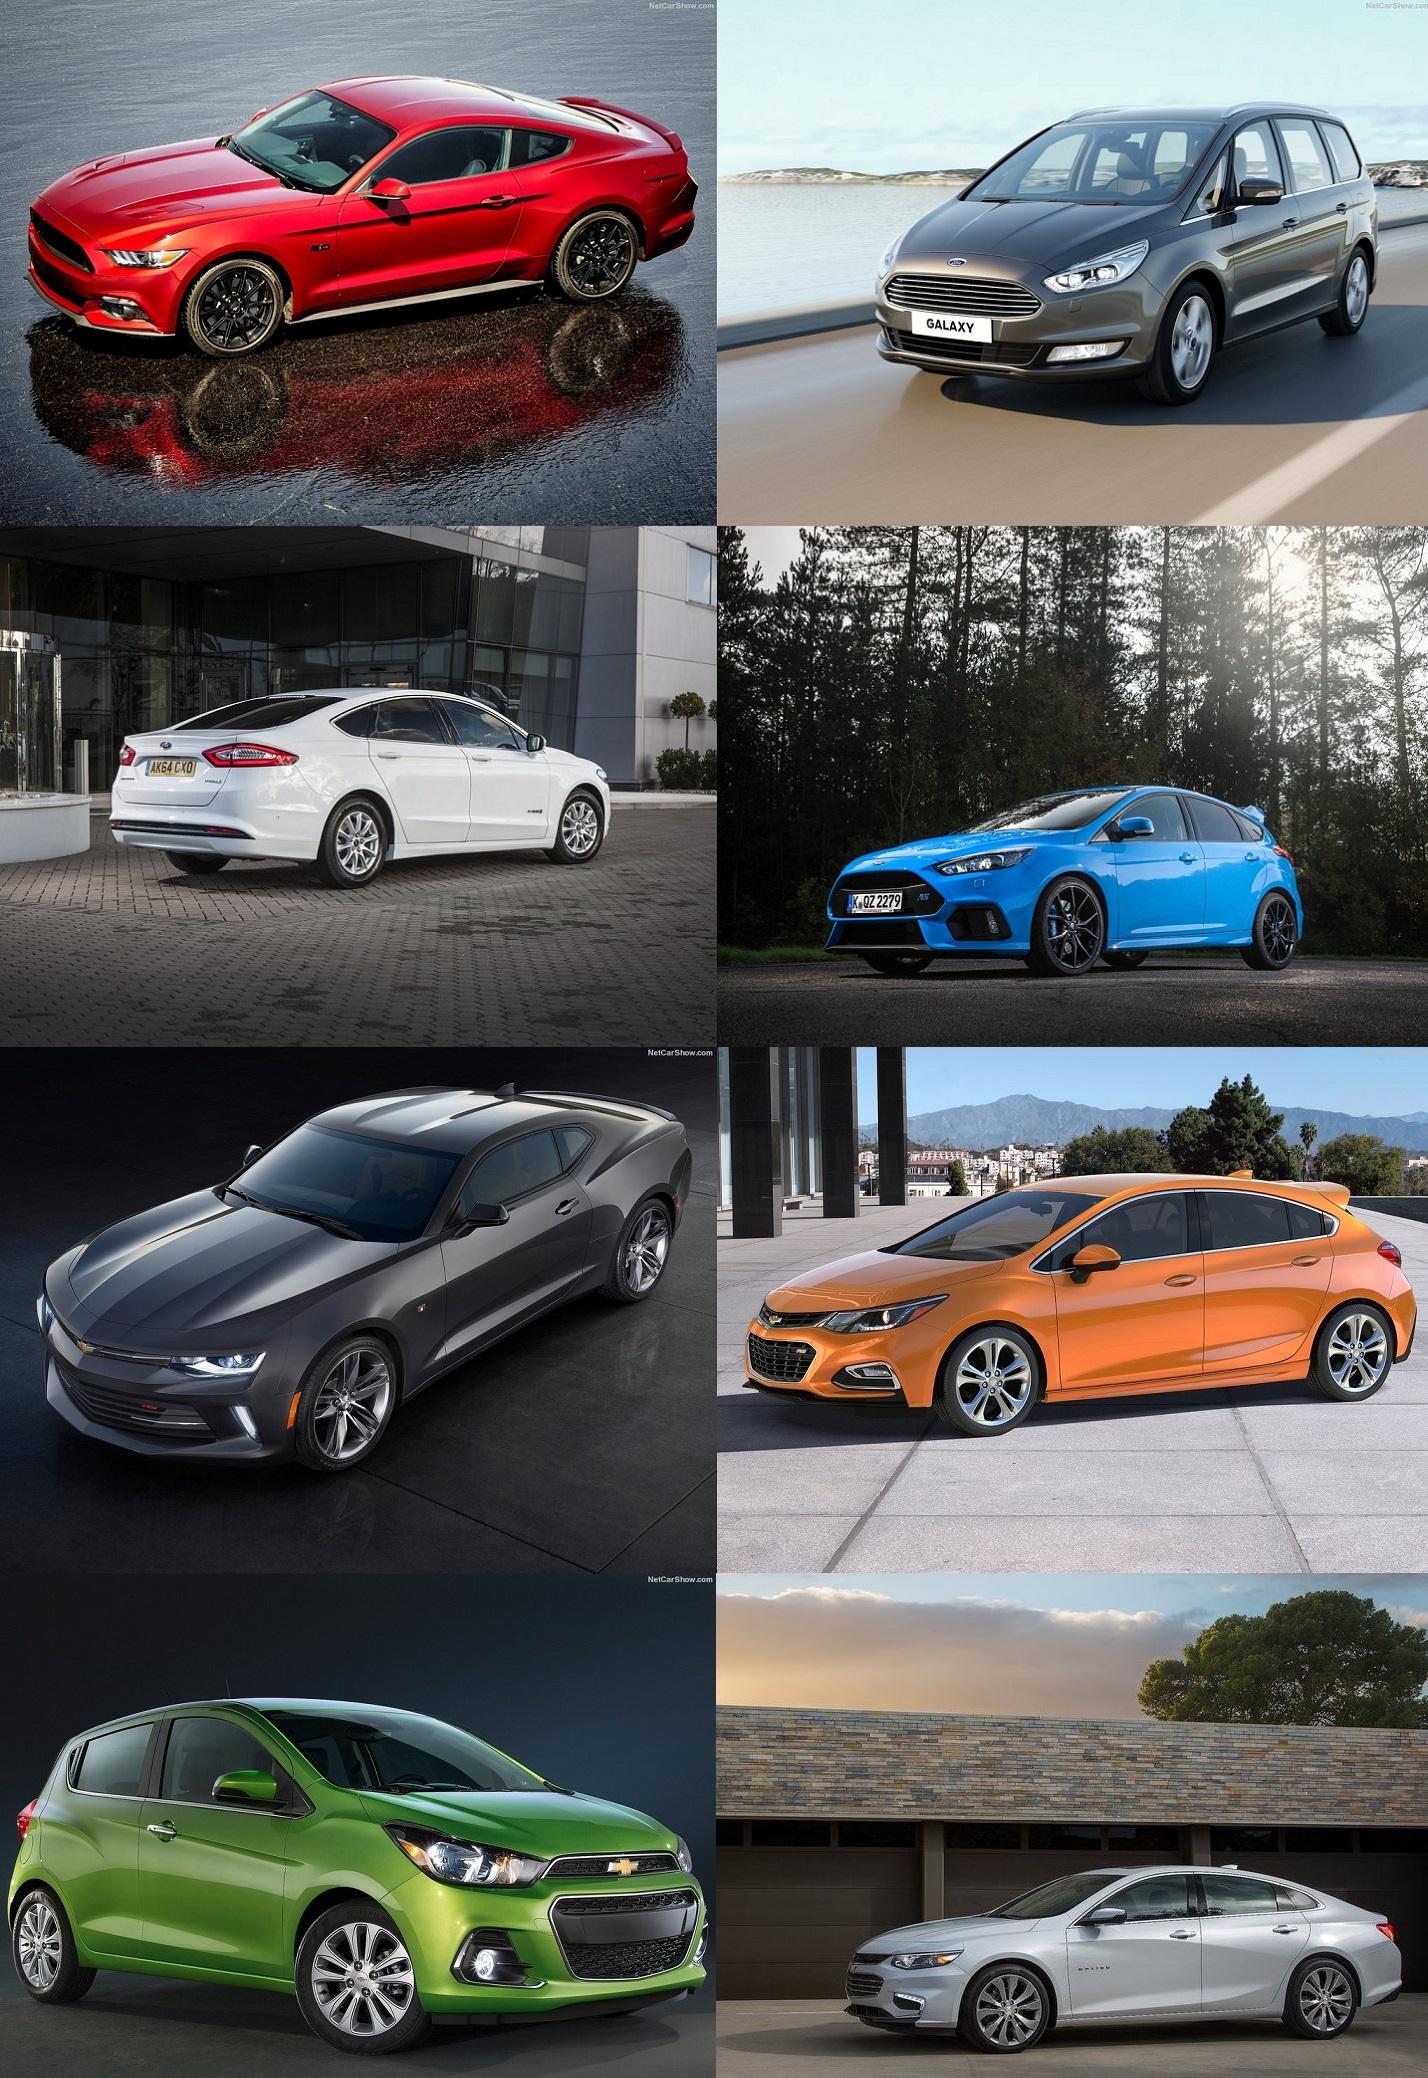 Ford-Mustang_2016_1024x768_wallpaper_02